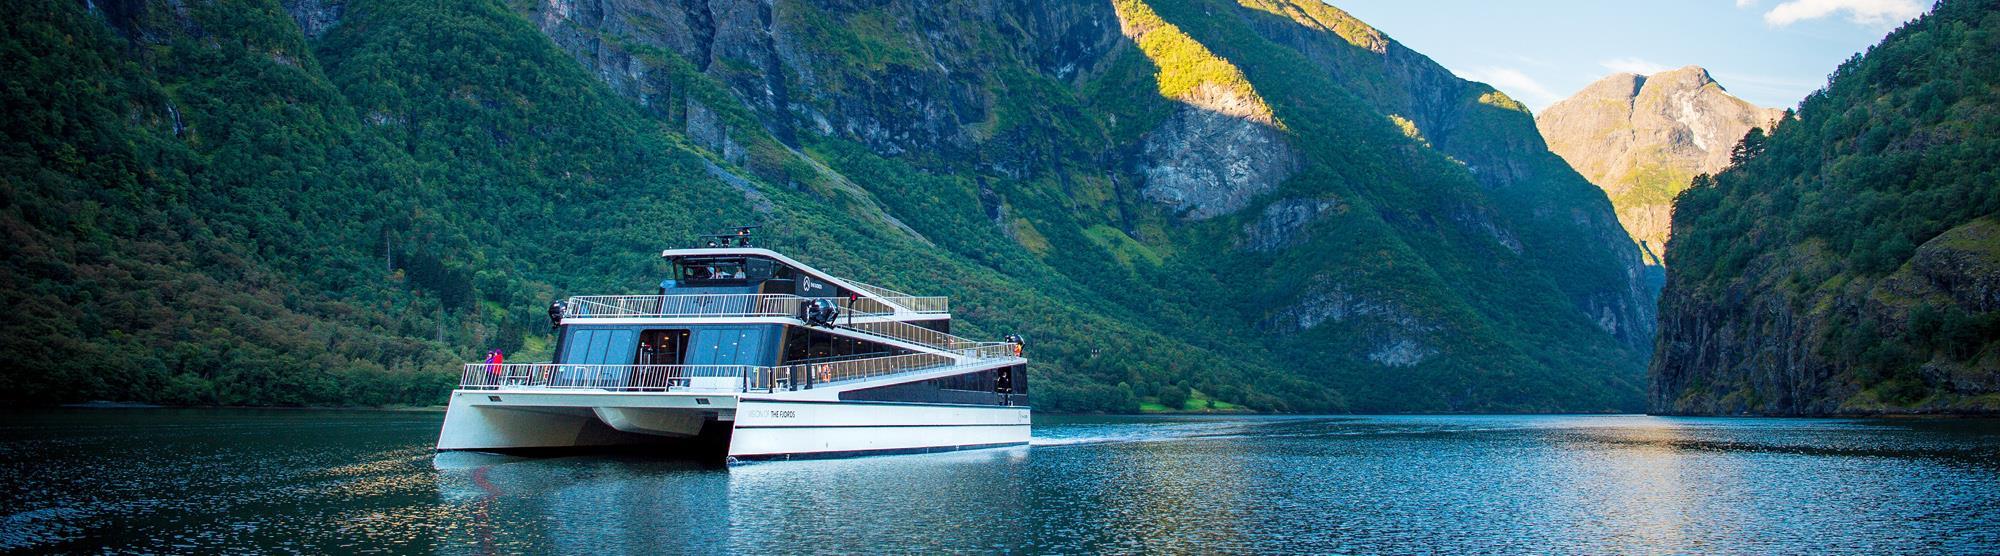 Tours Of Bergen Visitbergen Com